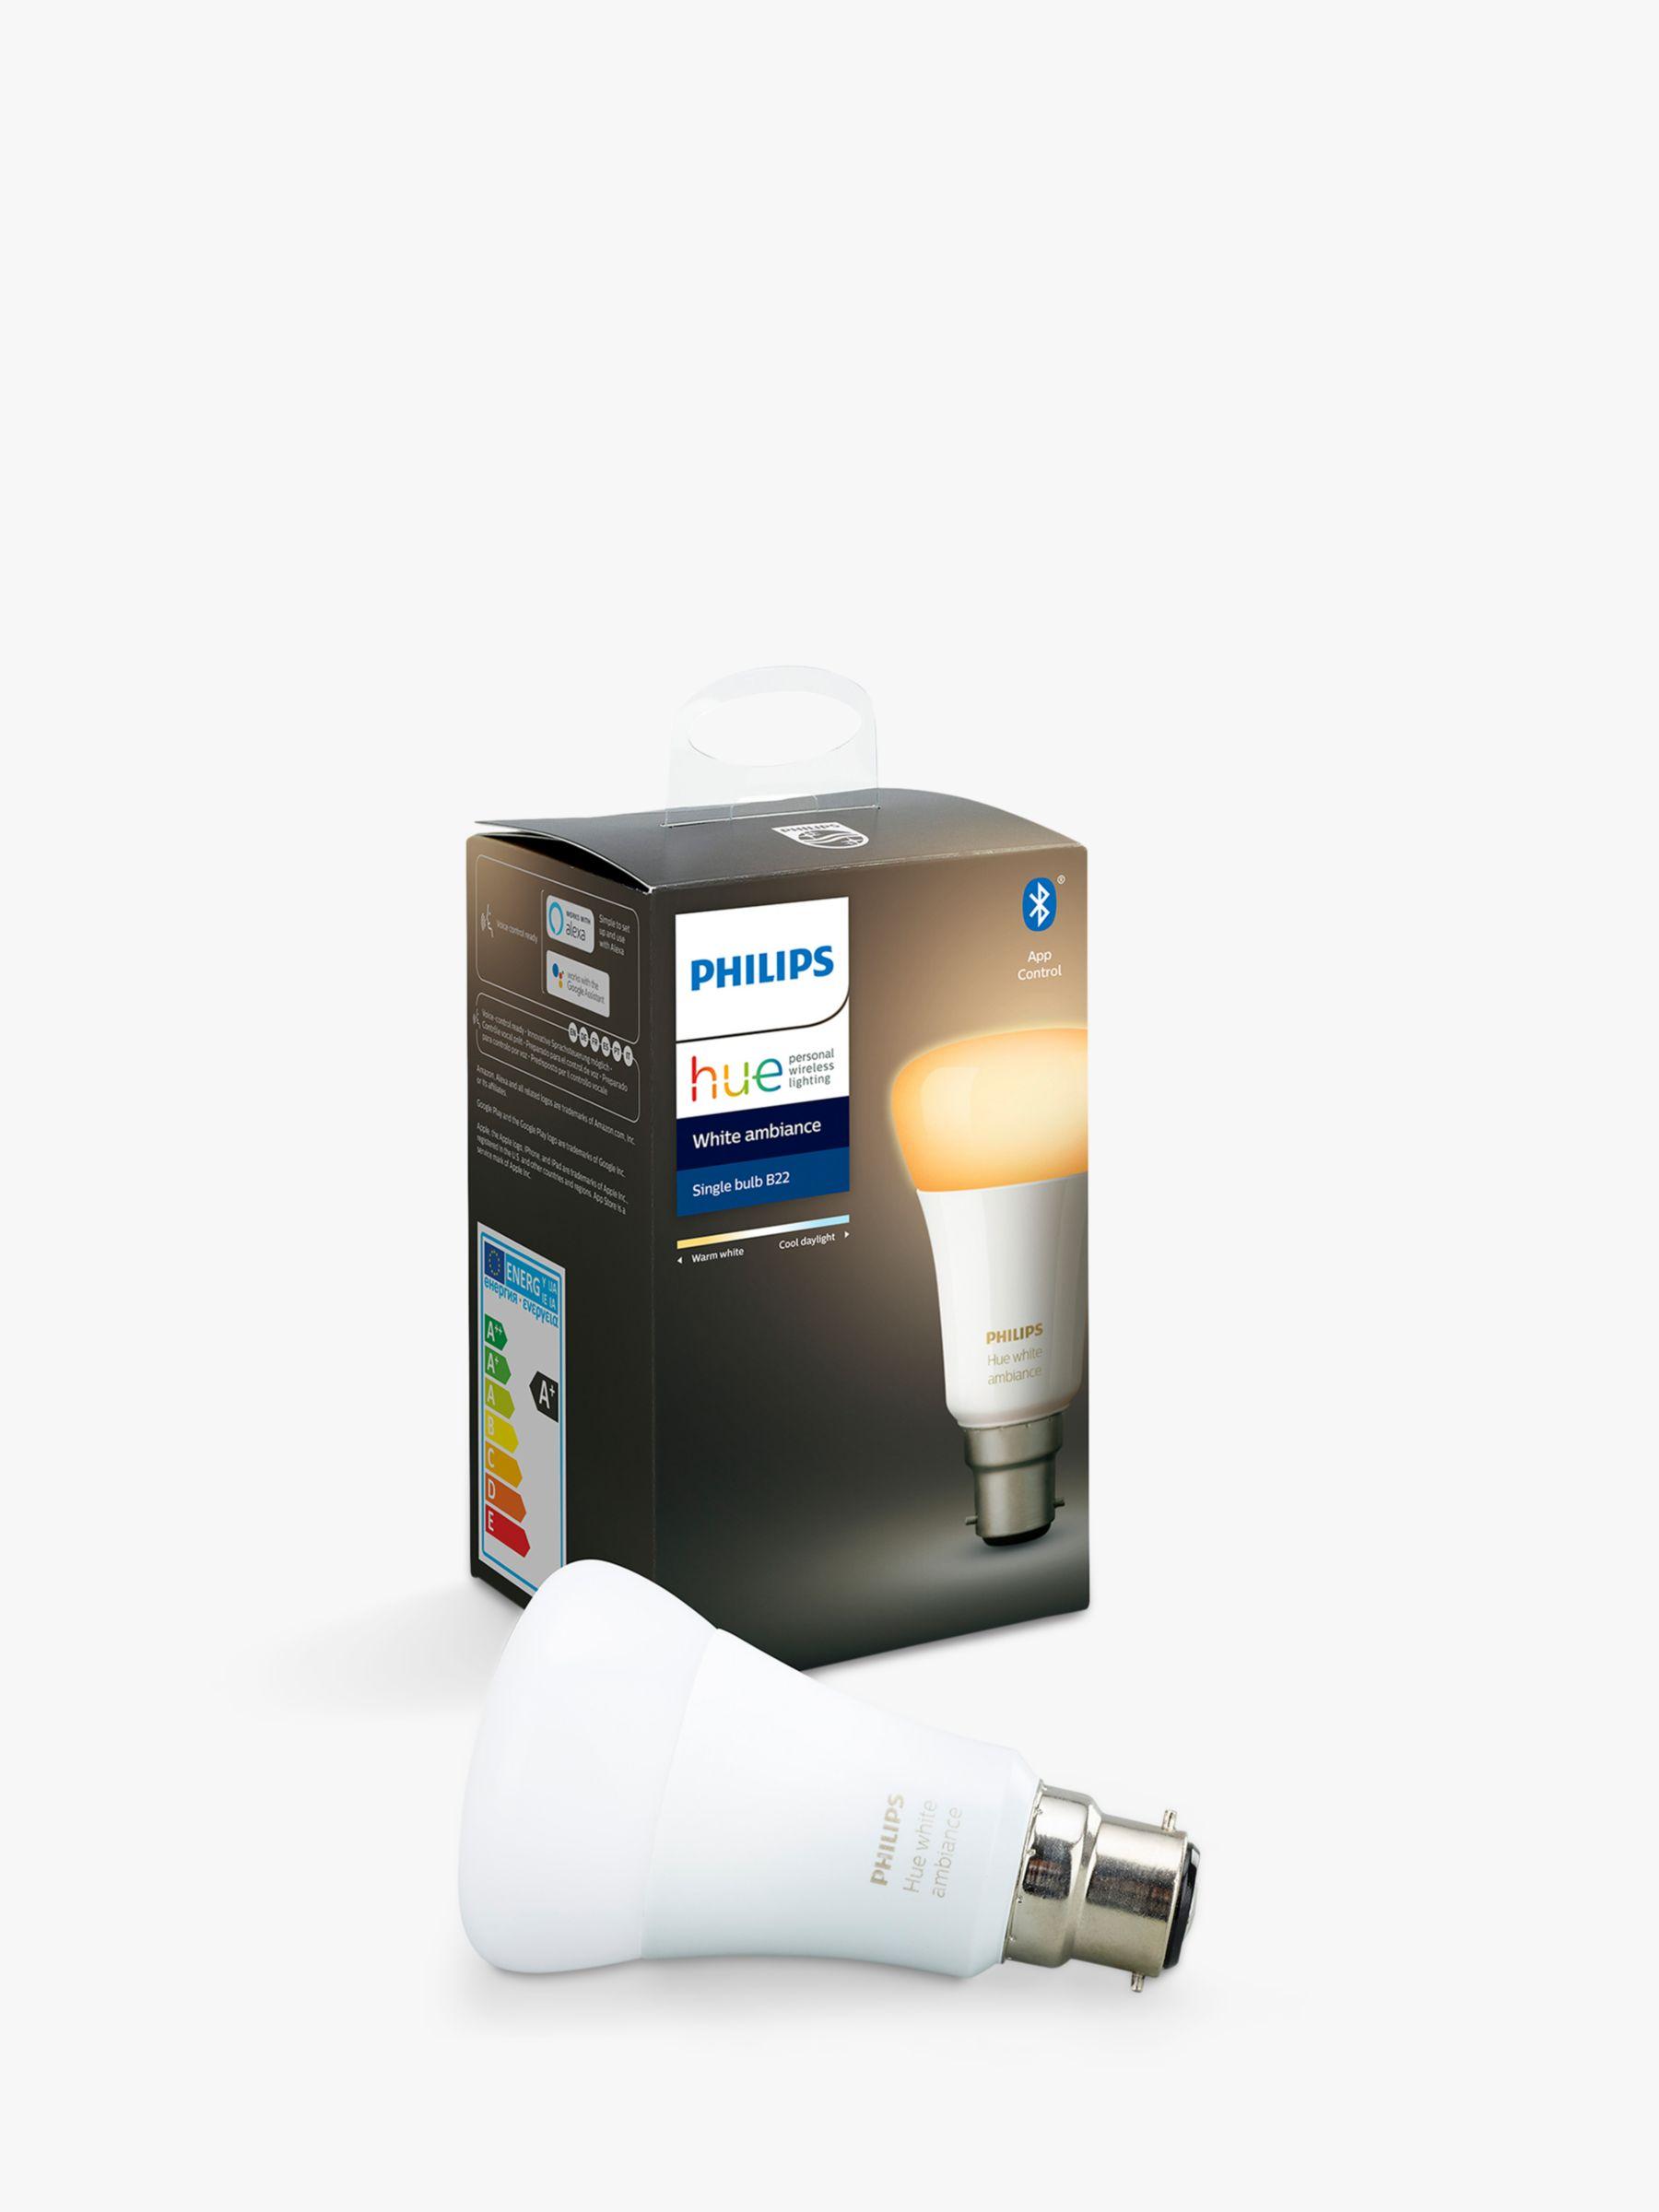 Philips Philips Hue White Ambiance Wireless Lighting LED Light Bulb with Bluetooth, 9W A60 B22 Bayonet Cap Bulb, Single